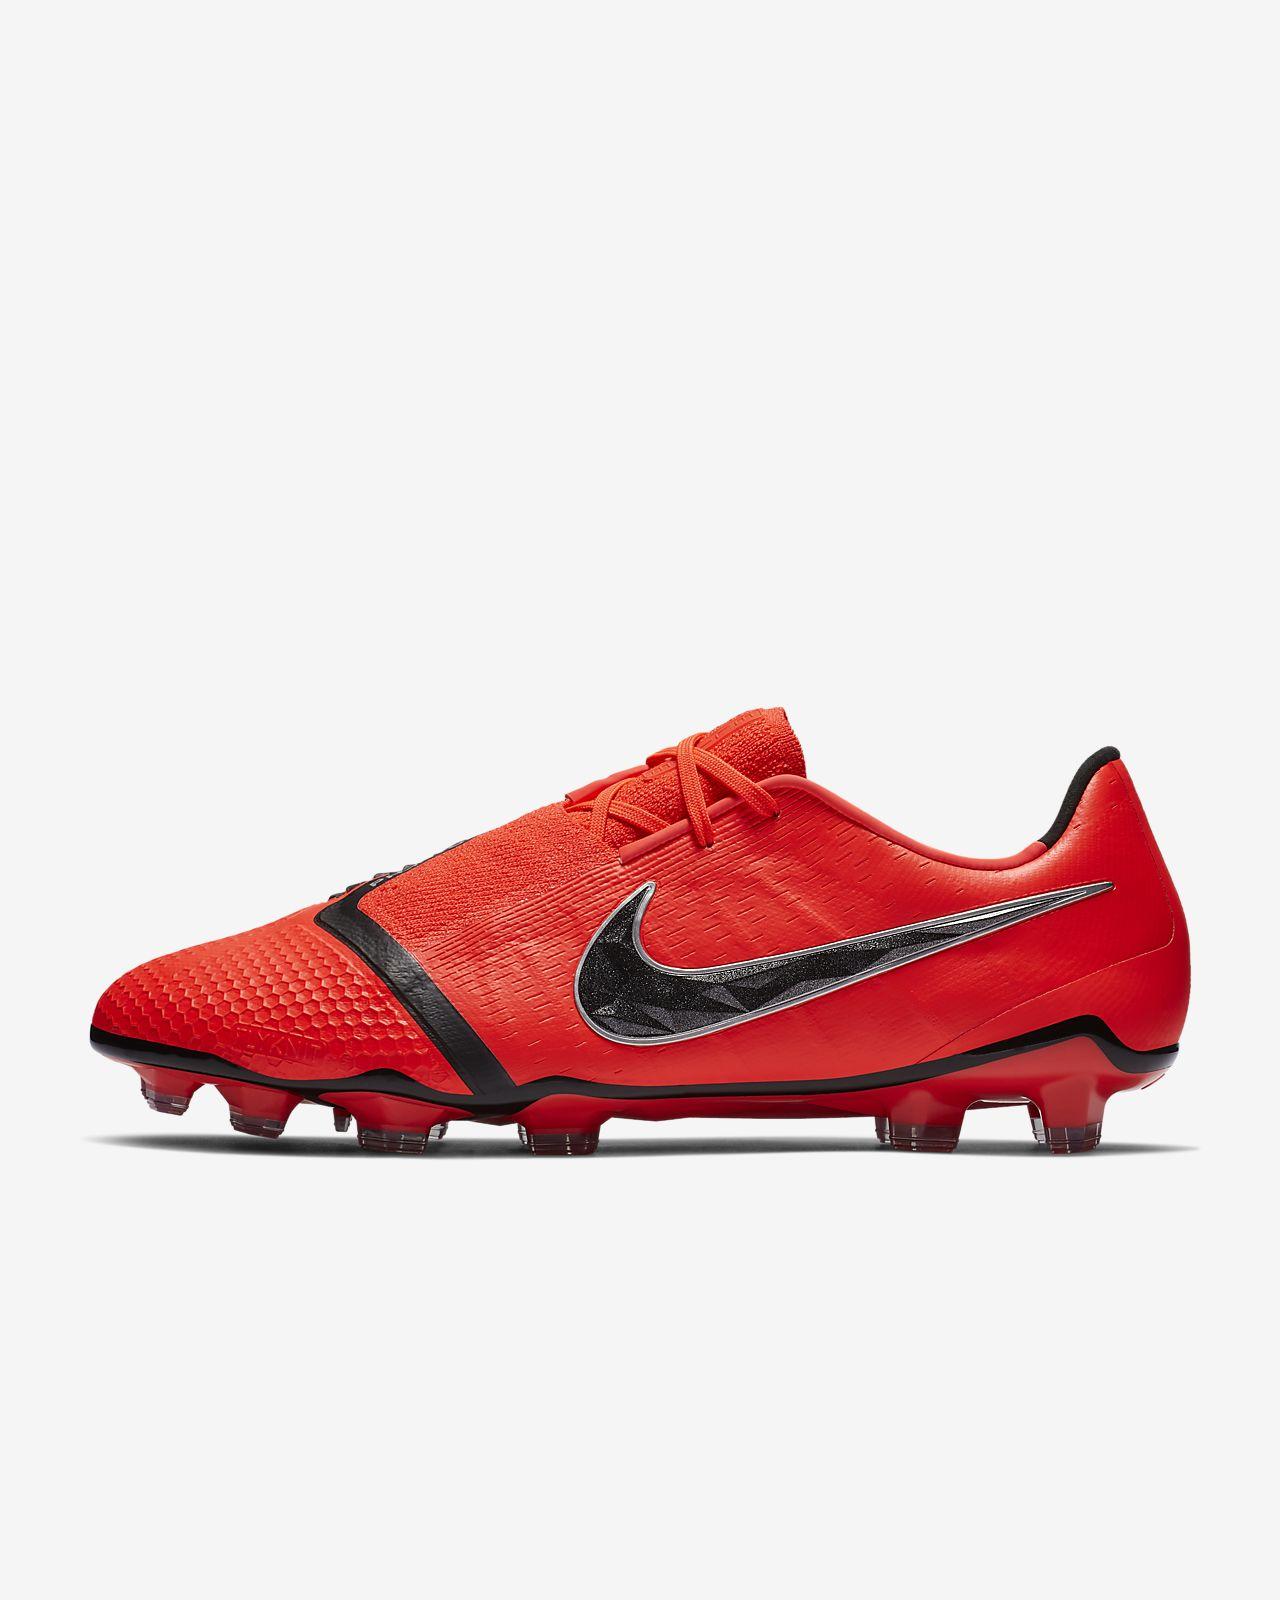 477042fb60b Nike PhantomVNM Elite Game Over FG Firm-Ground Football Boot. Nike ...